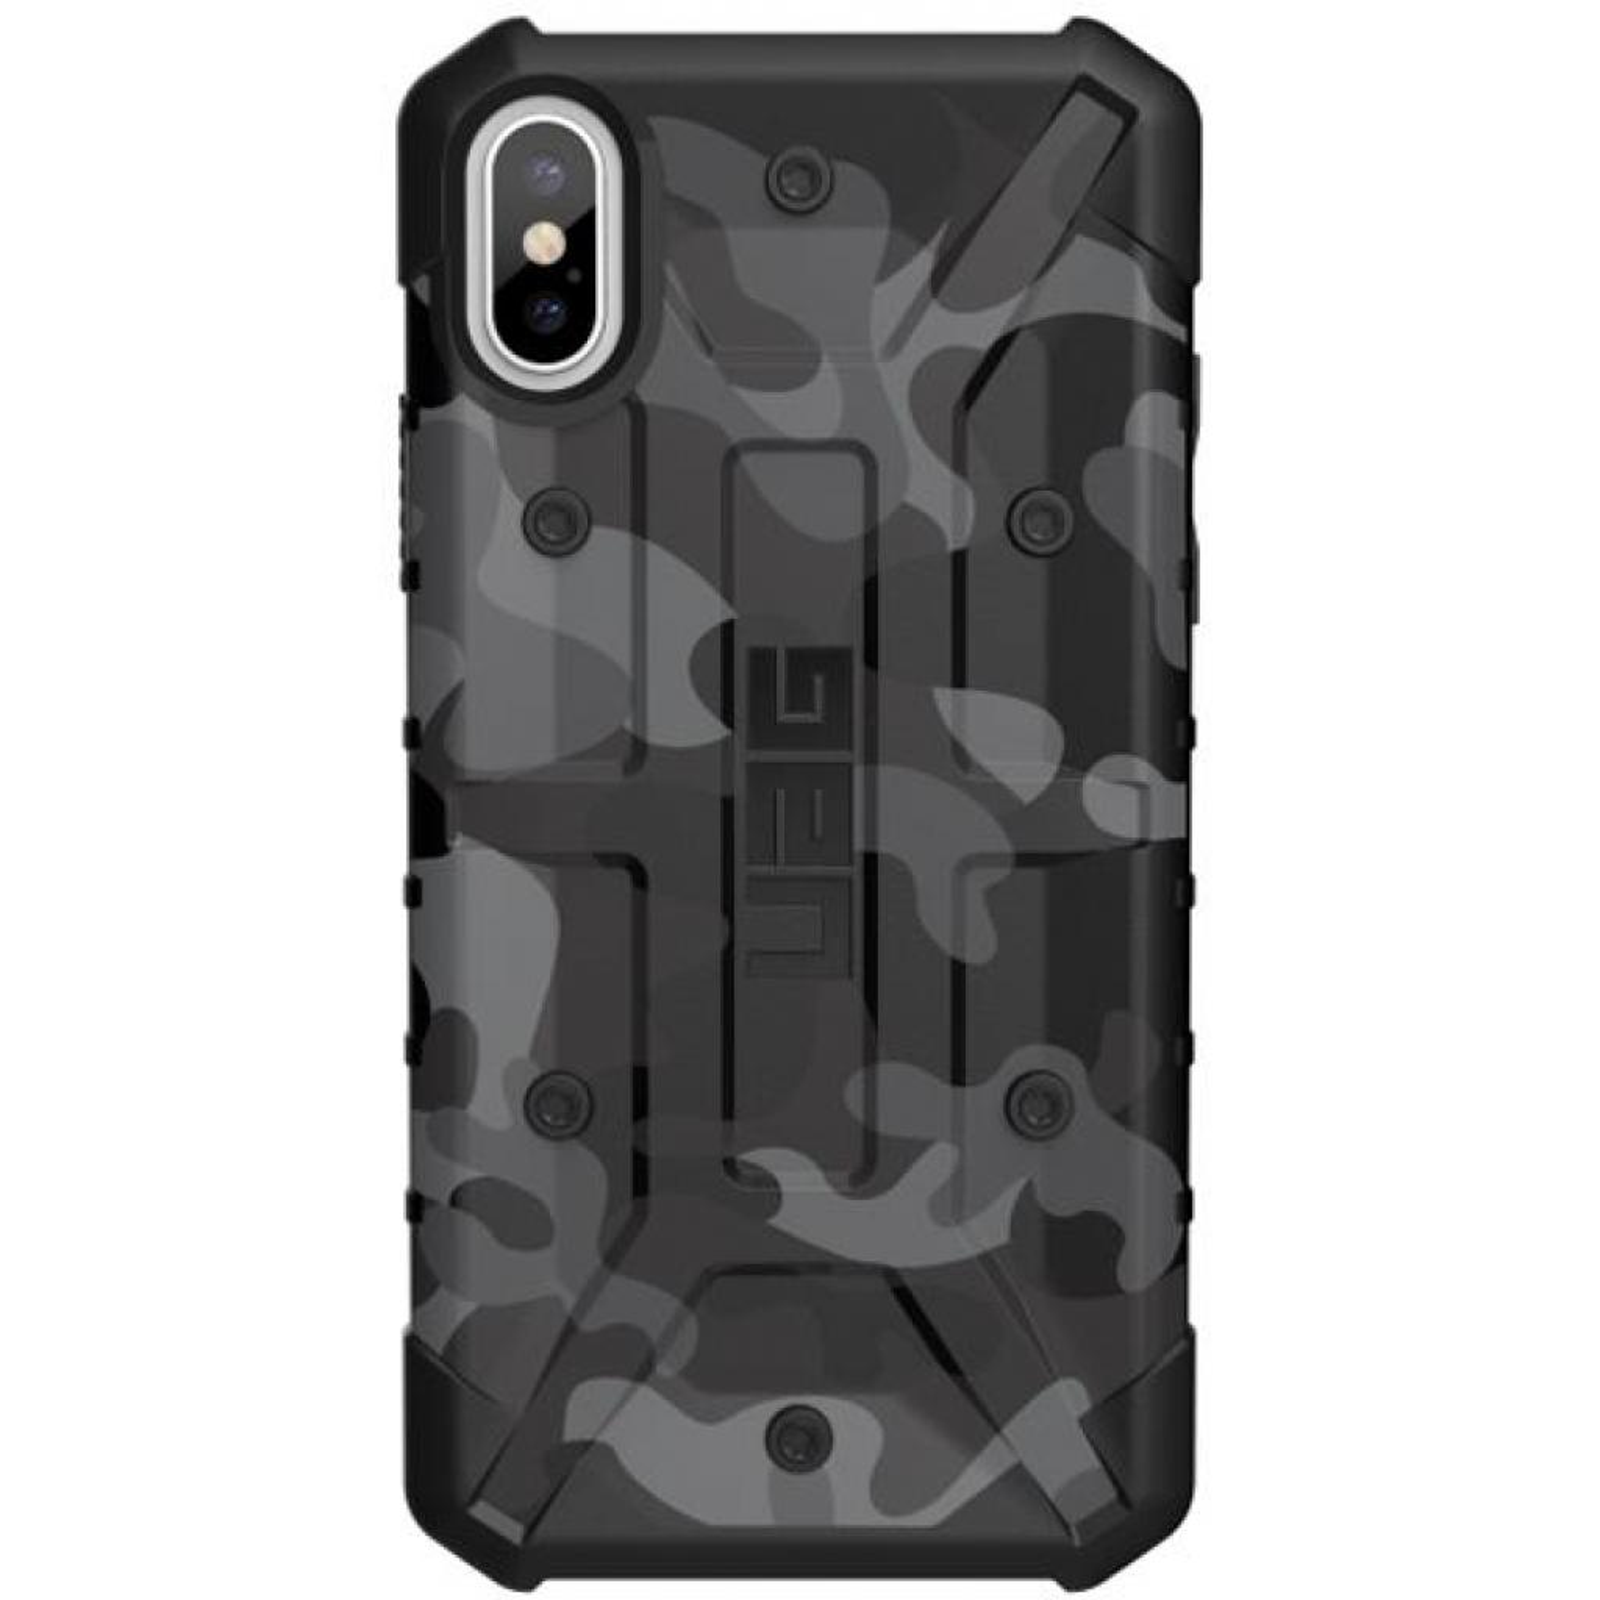 Чехол для моб. телефона UAG iPhone X Pathfinder Camo Gray/Black (IPHX-A-BC)